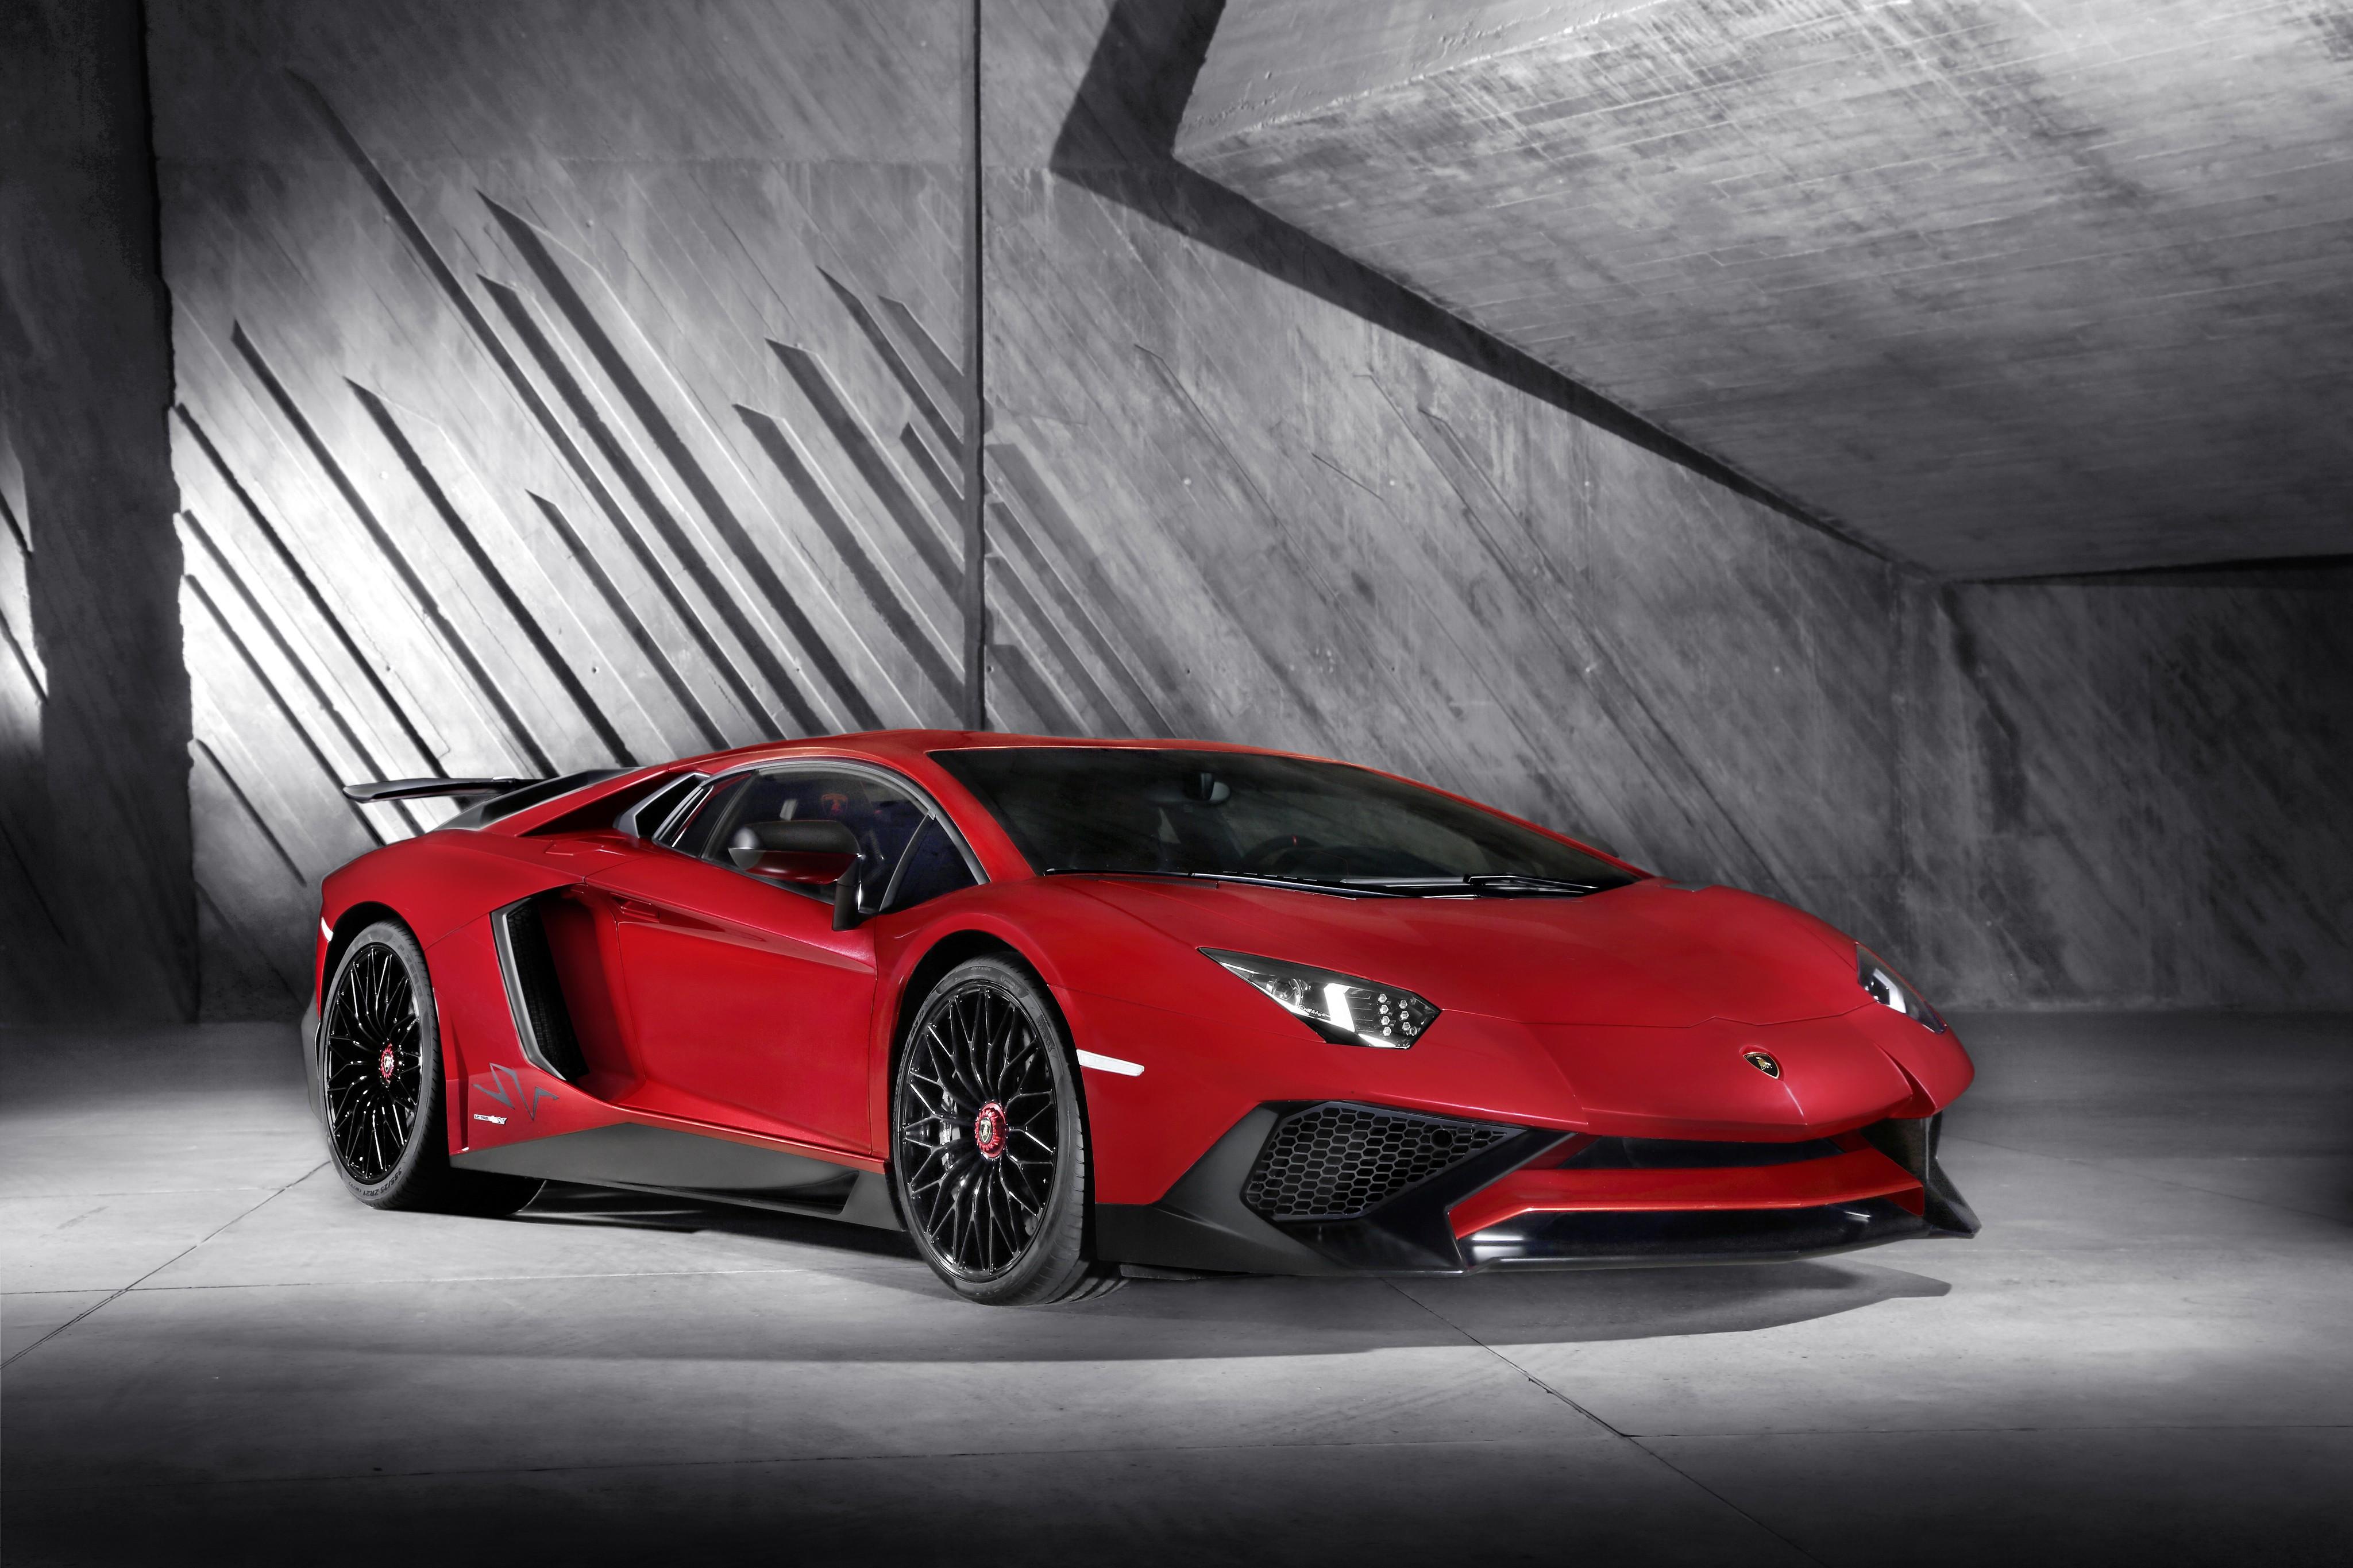 car lamborghini for price release concept engine redesign new aventador and